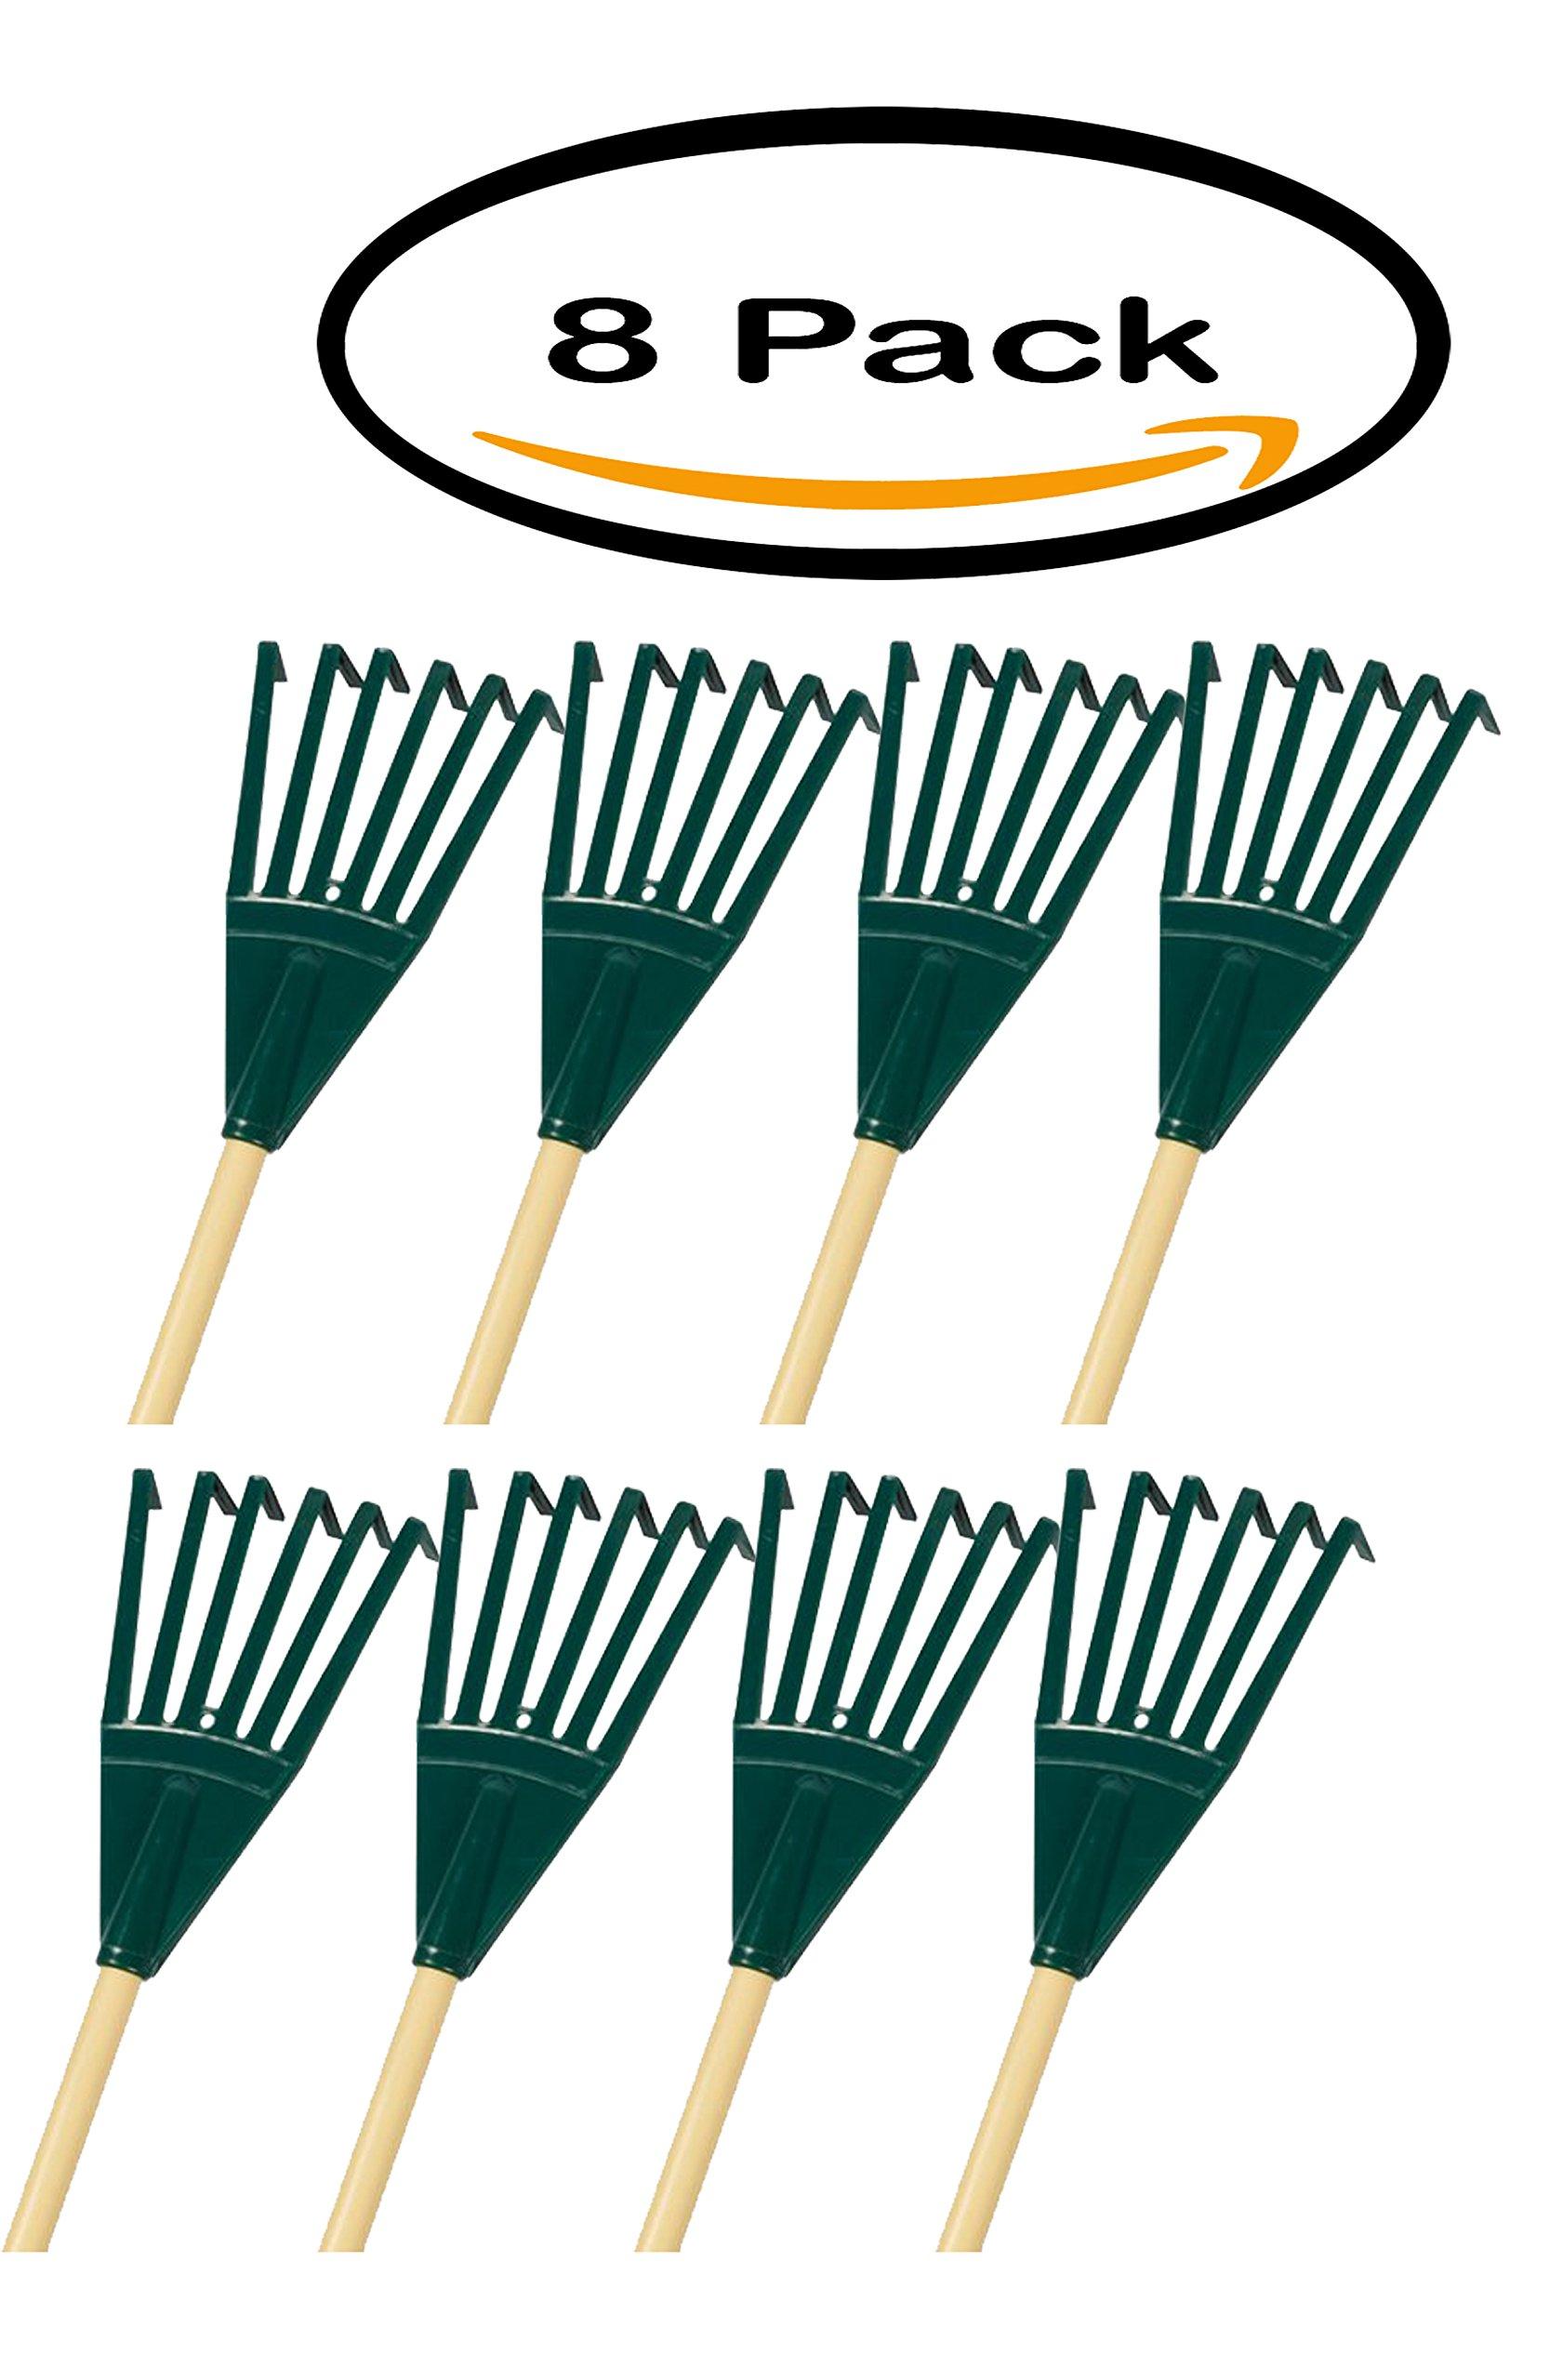 PACK OF 8 - Emsco Group 10'' Poly Shrub Rake